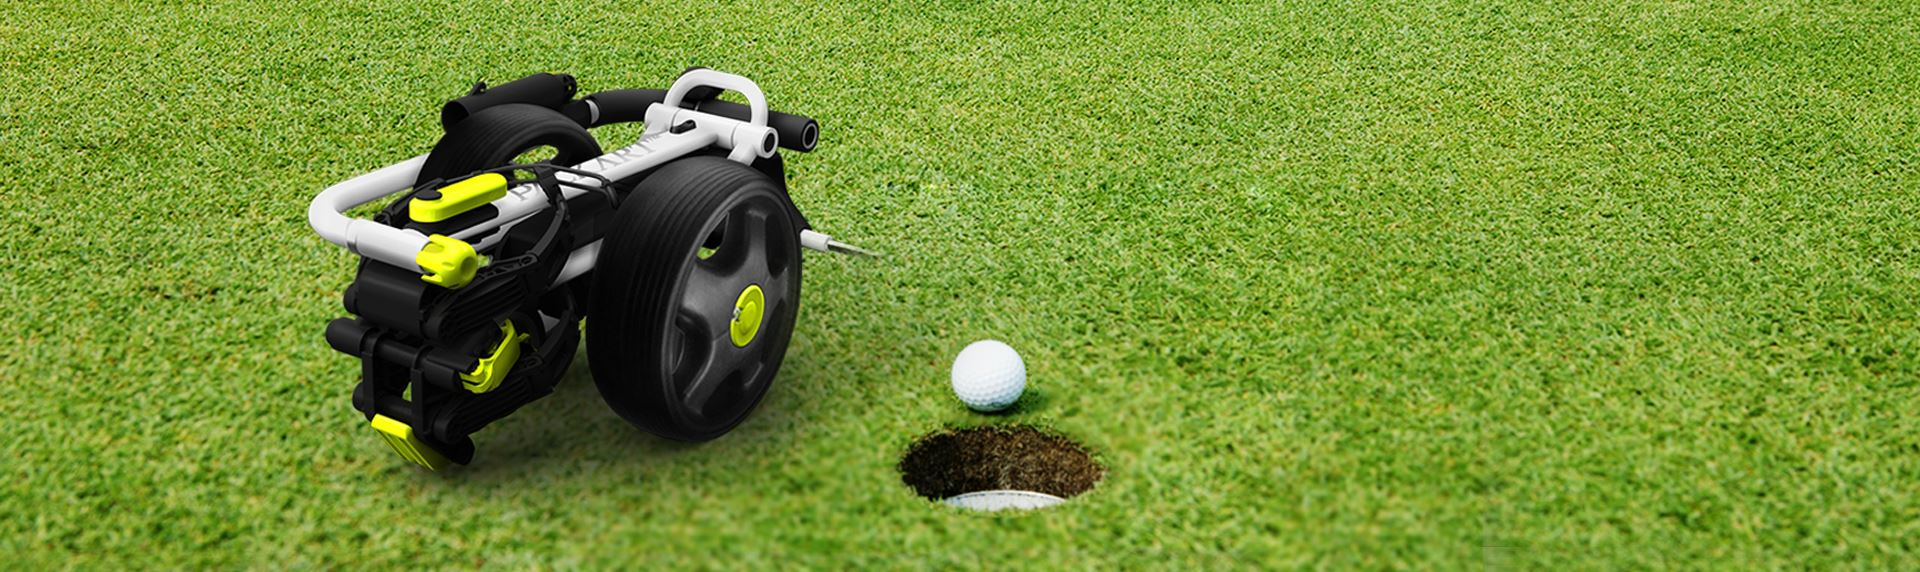 LOL资讯-高尔夫球包车Golf Cart